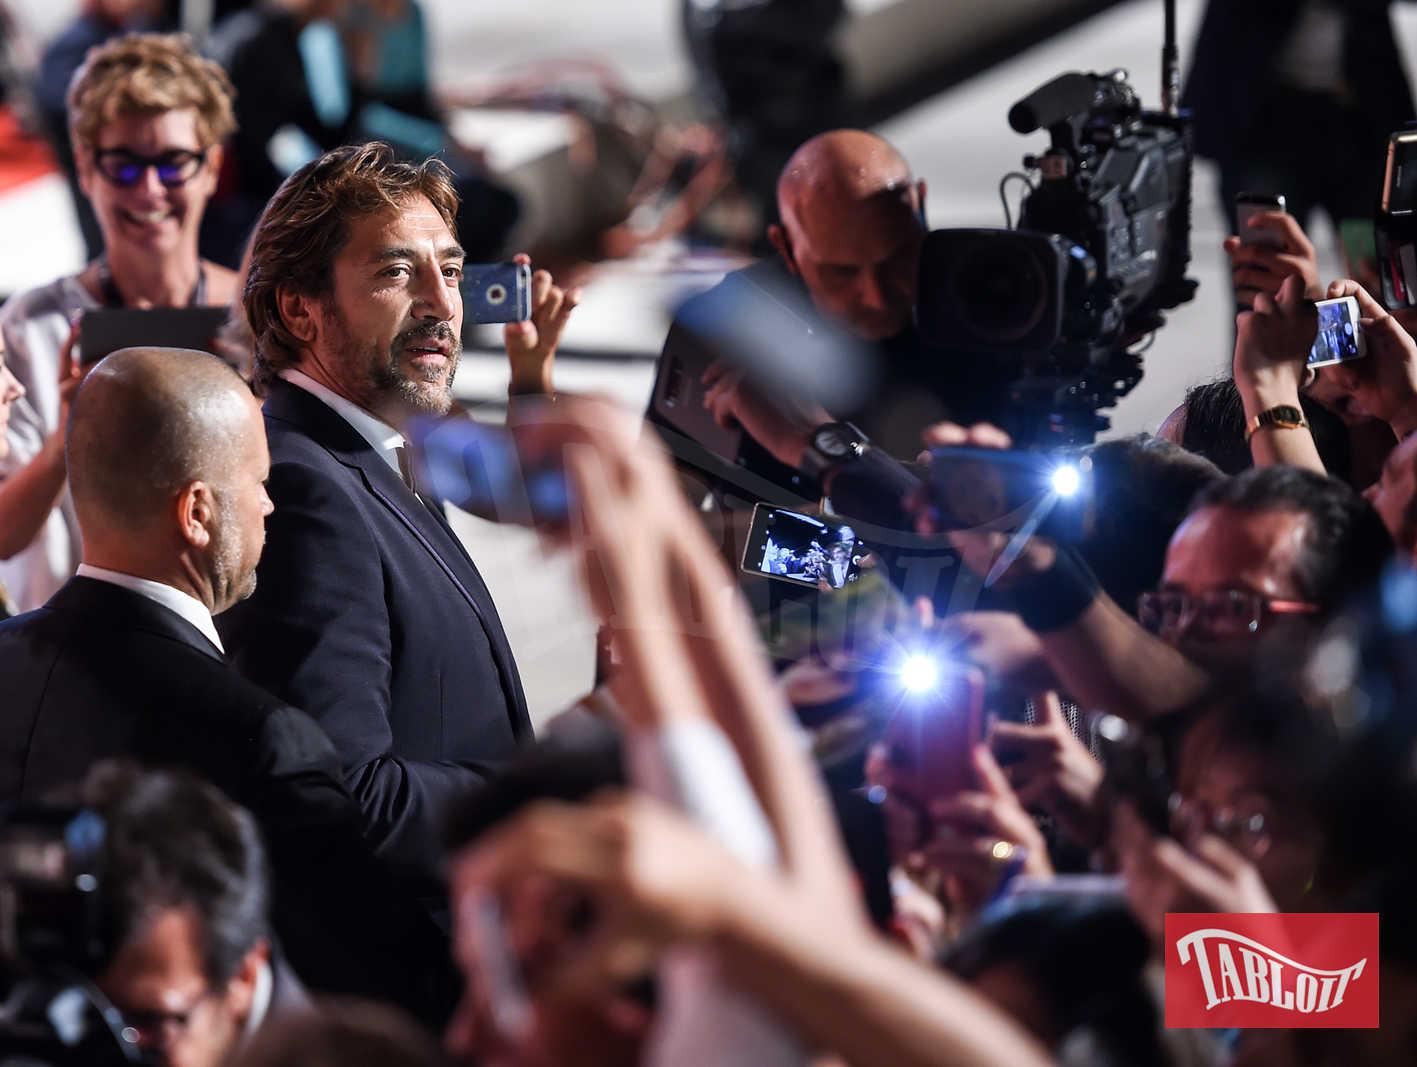 javier bardem e fans festival cinema venezia